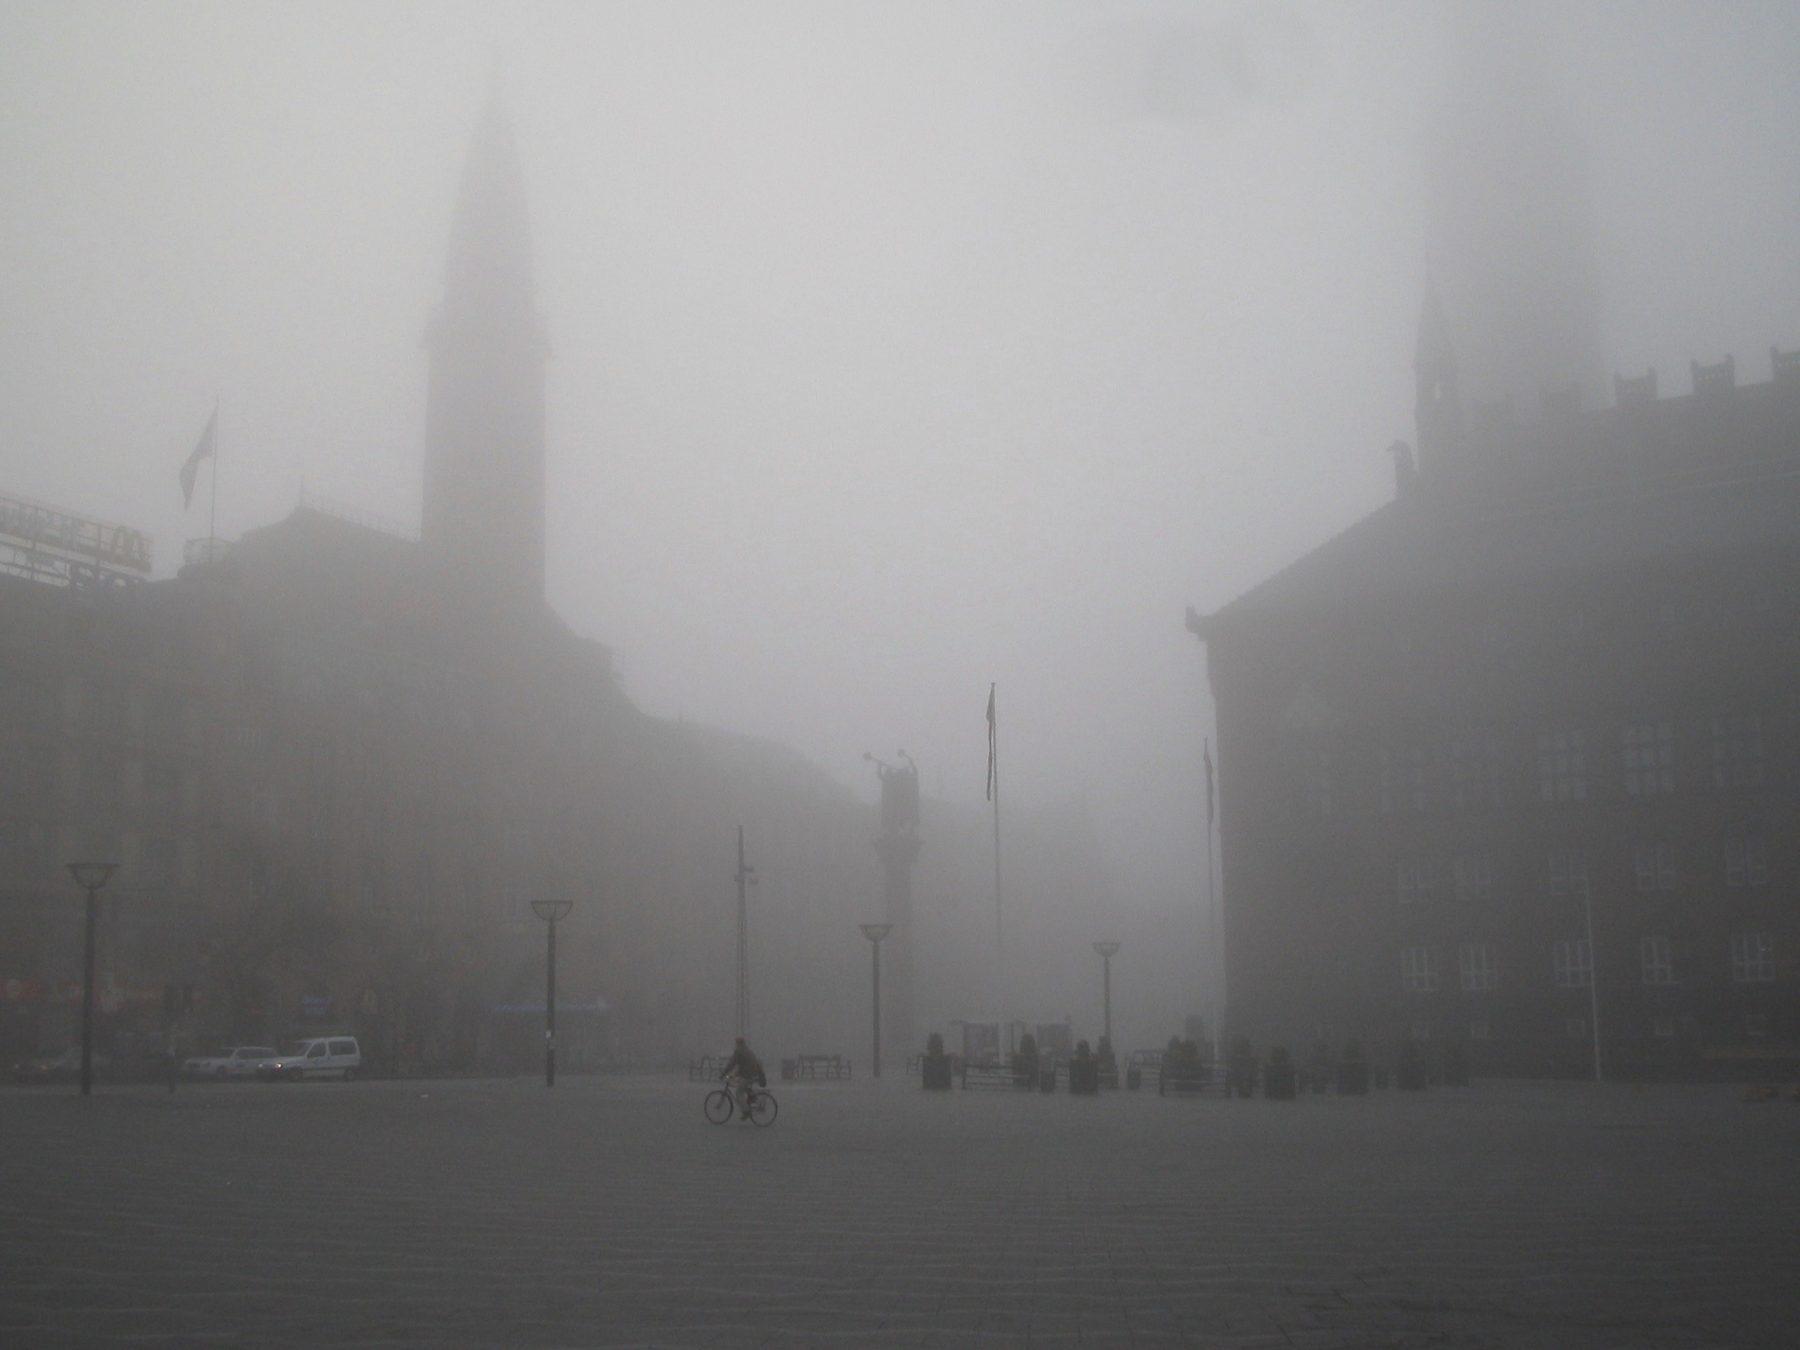 Snapshot fra hverdagen: Rådhuspladsen i kraftig tåge